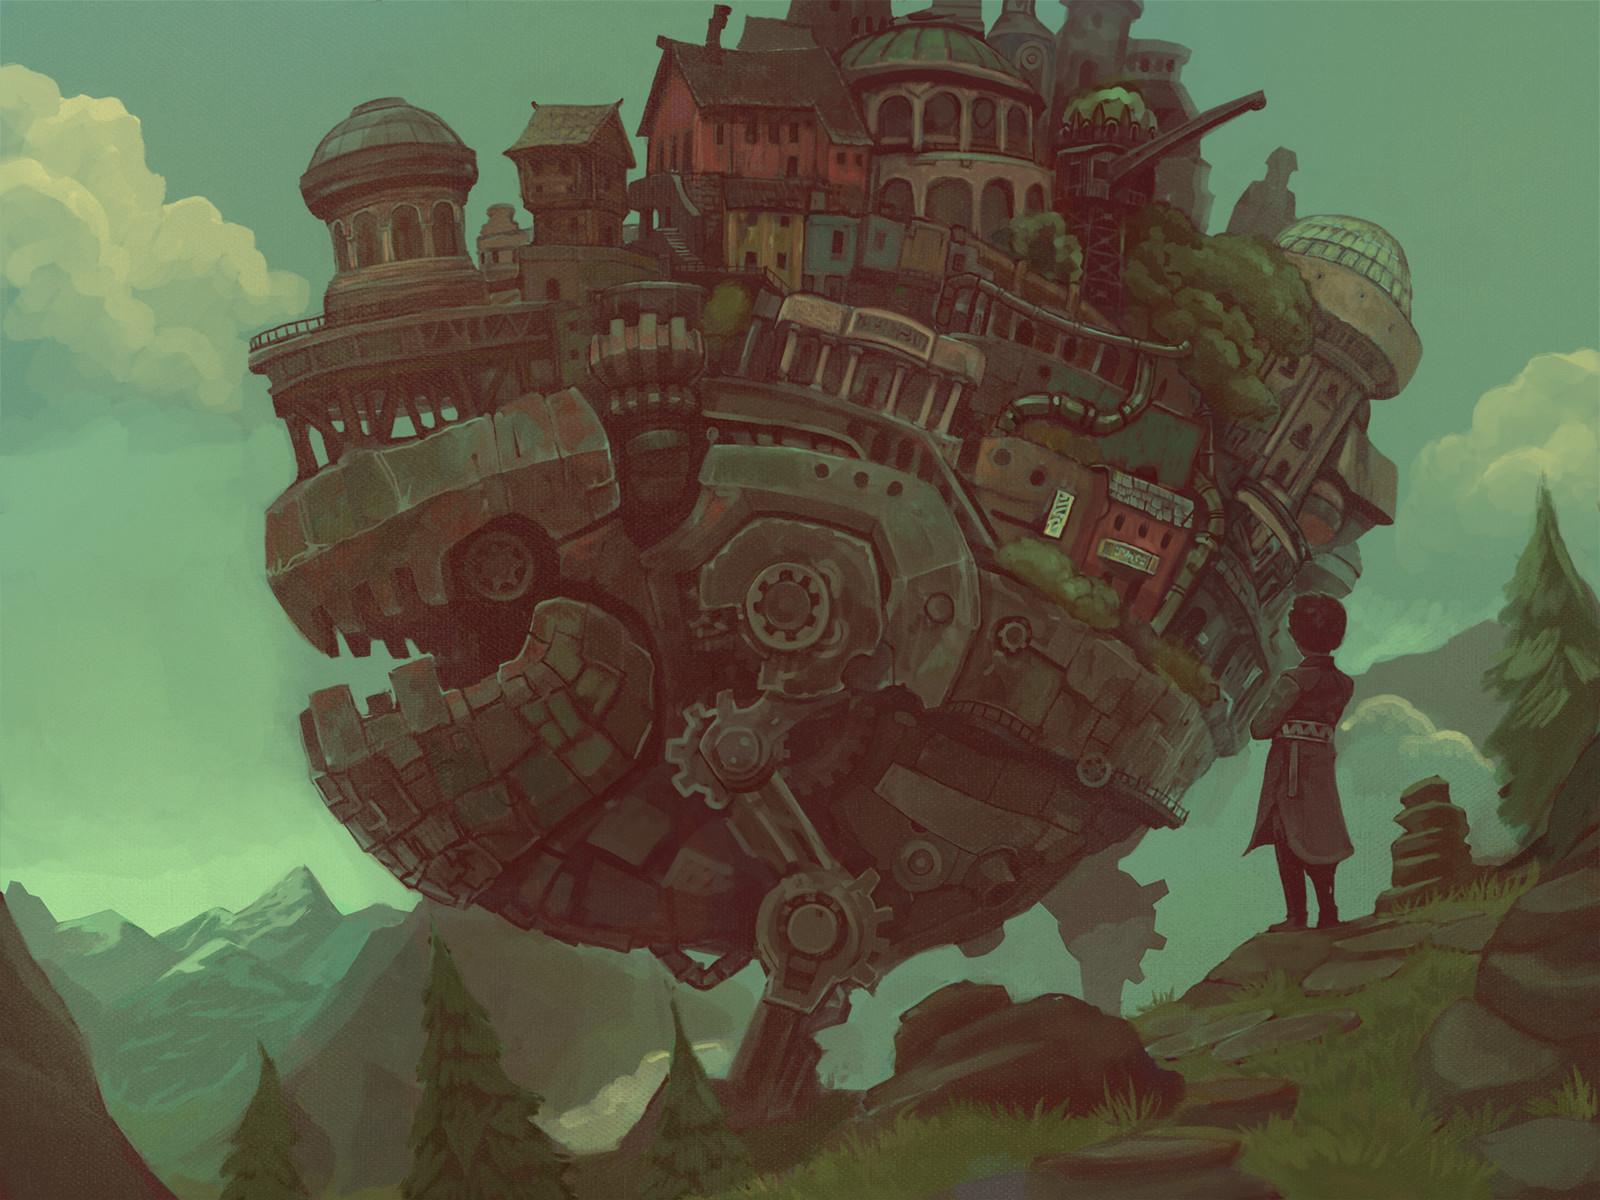 Wander City